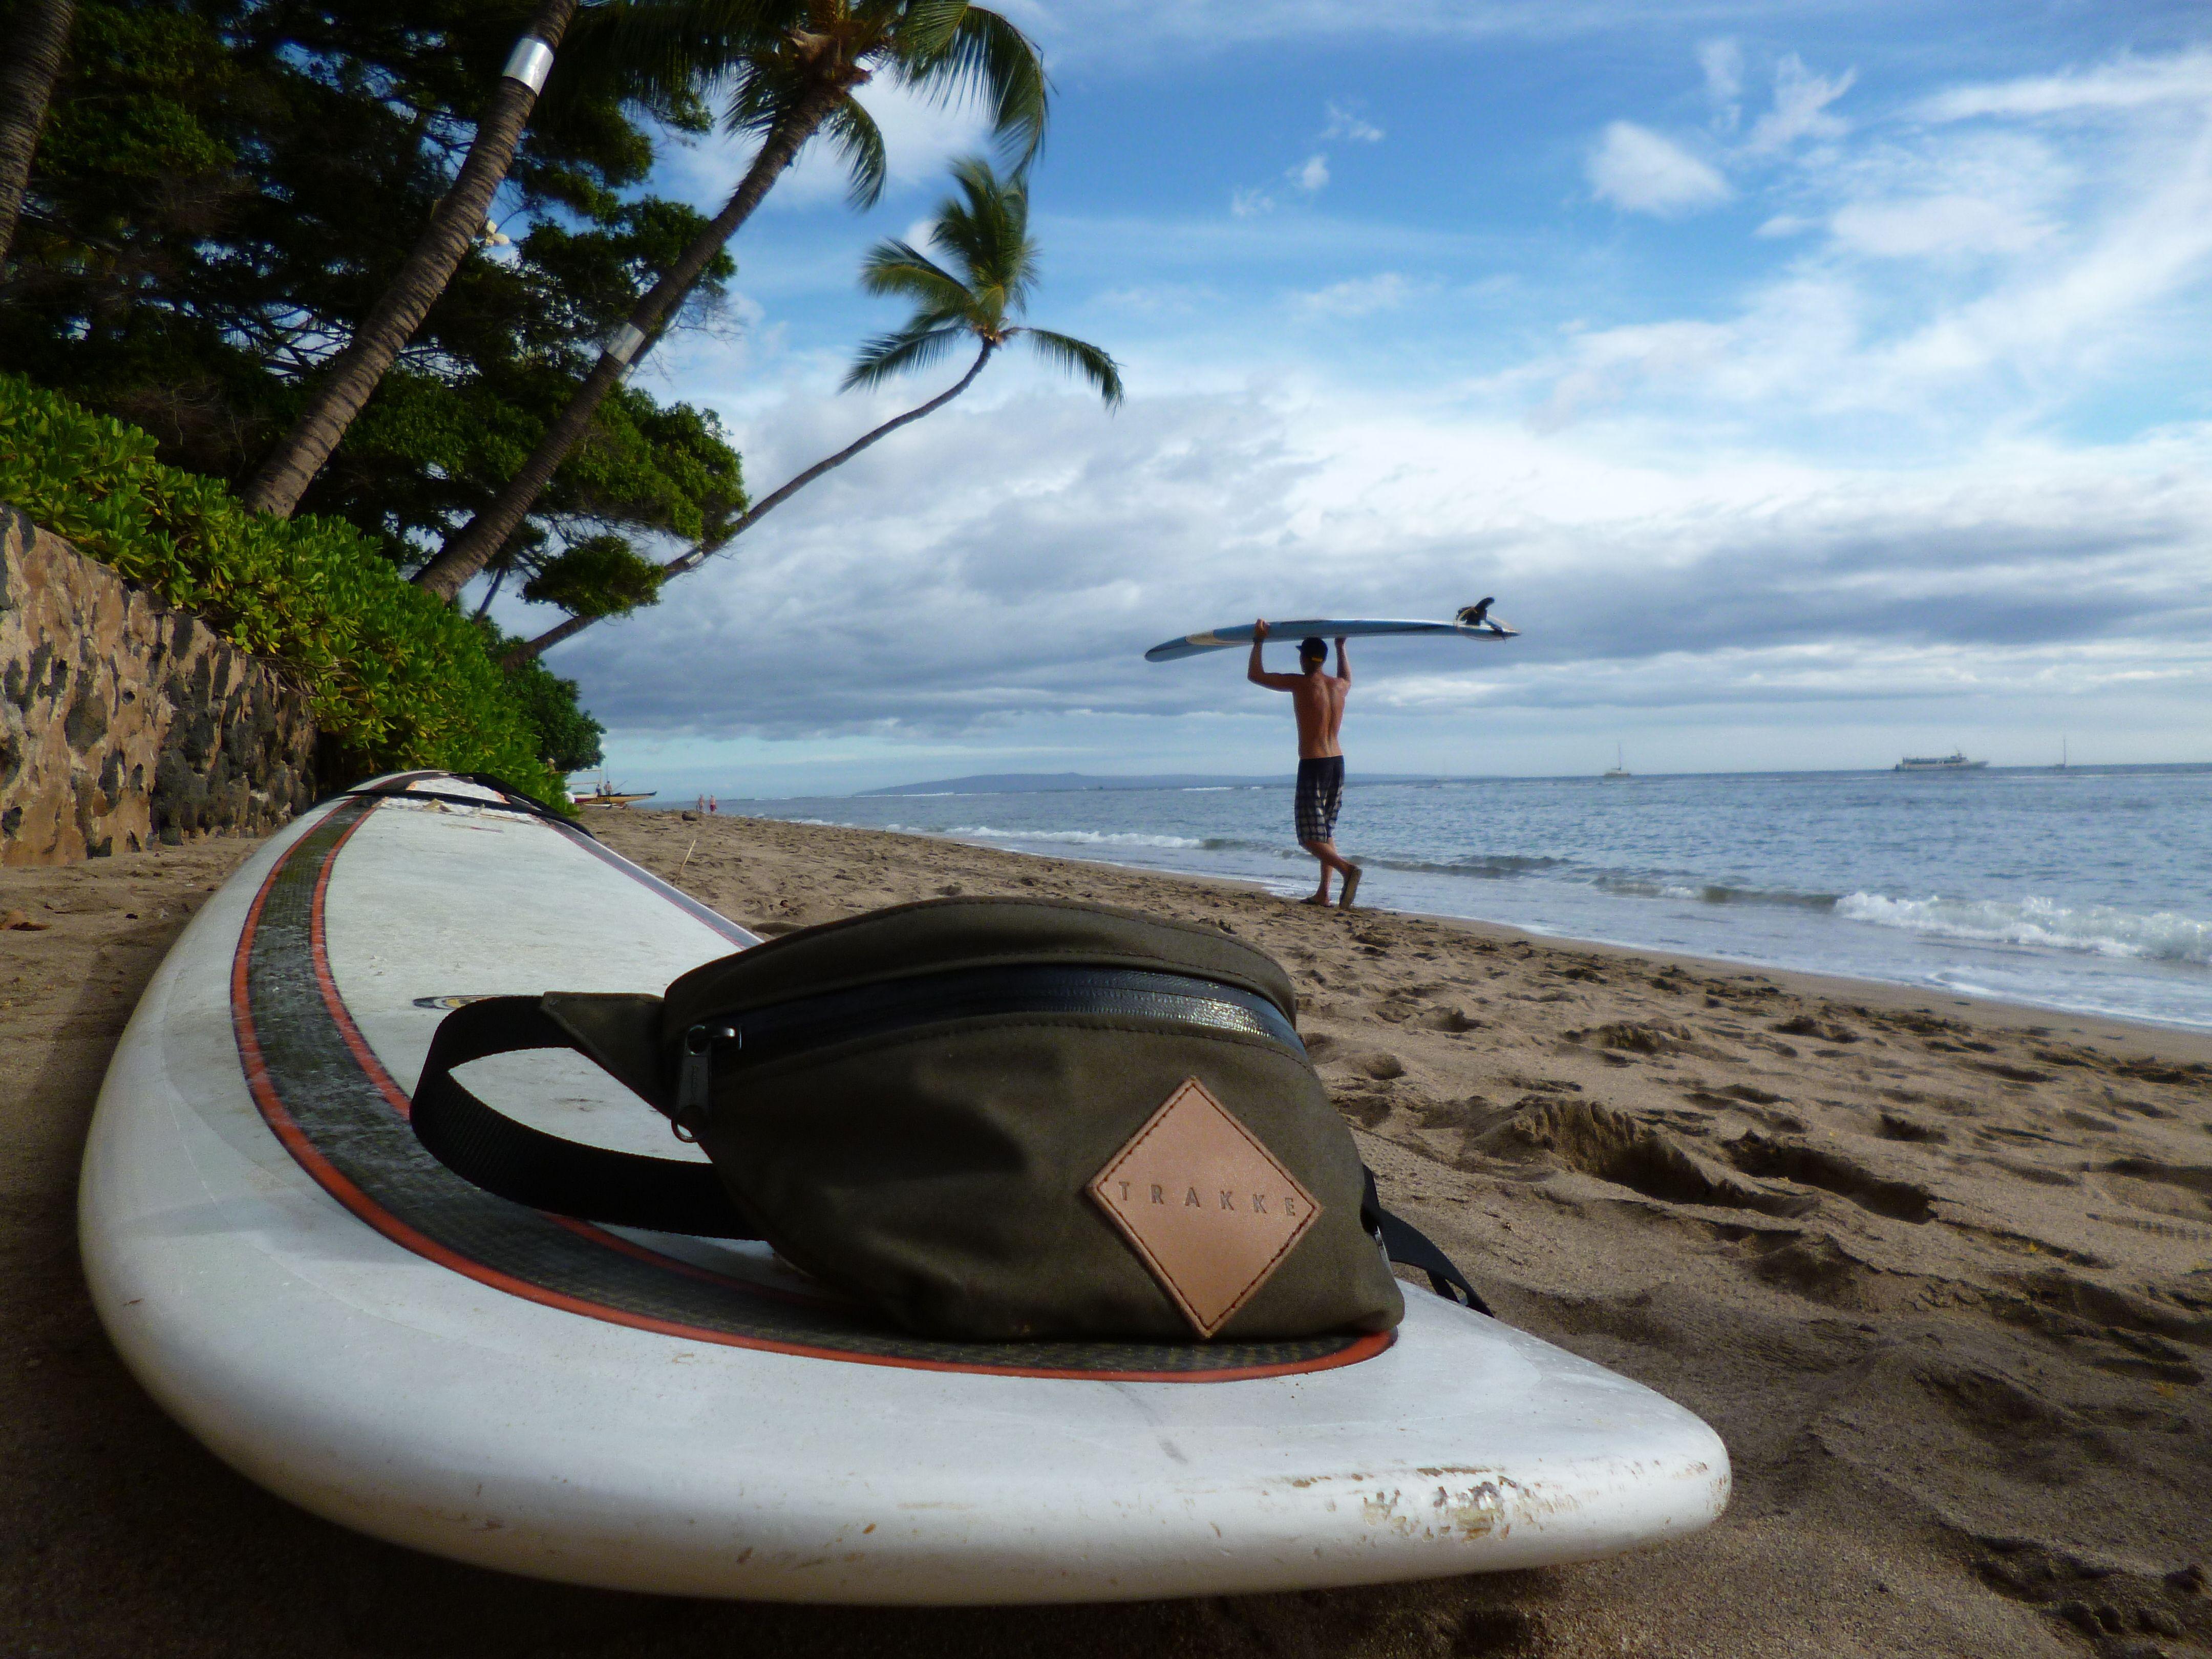 Kate Skalova with a Trakke Banana in Hawaii.